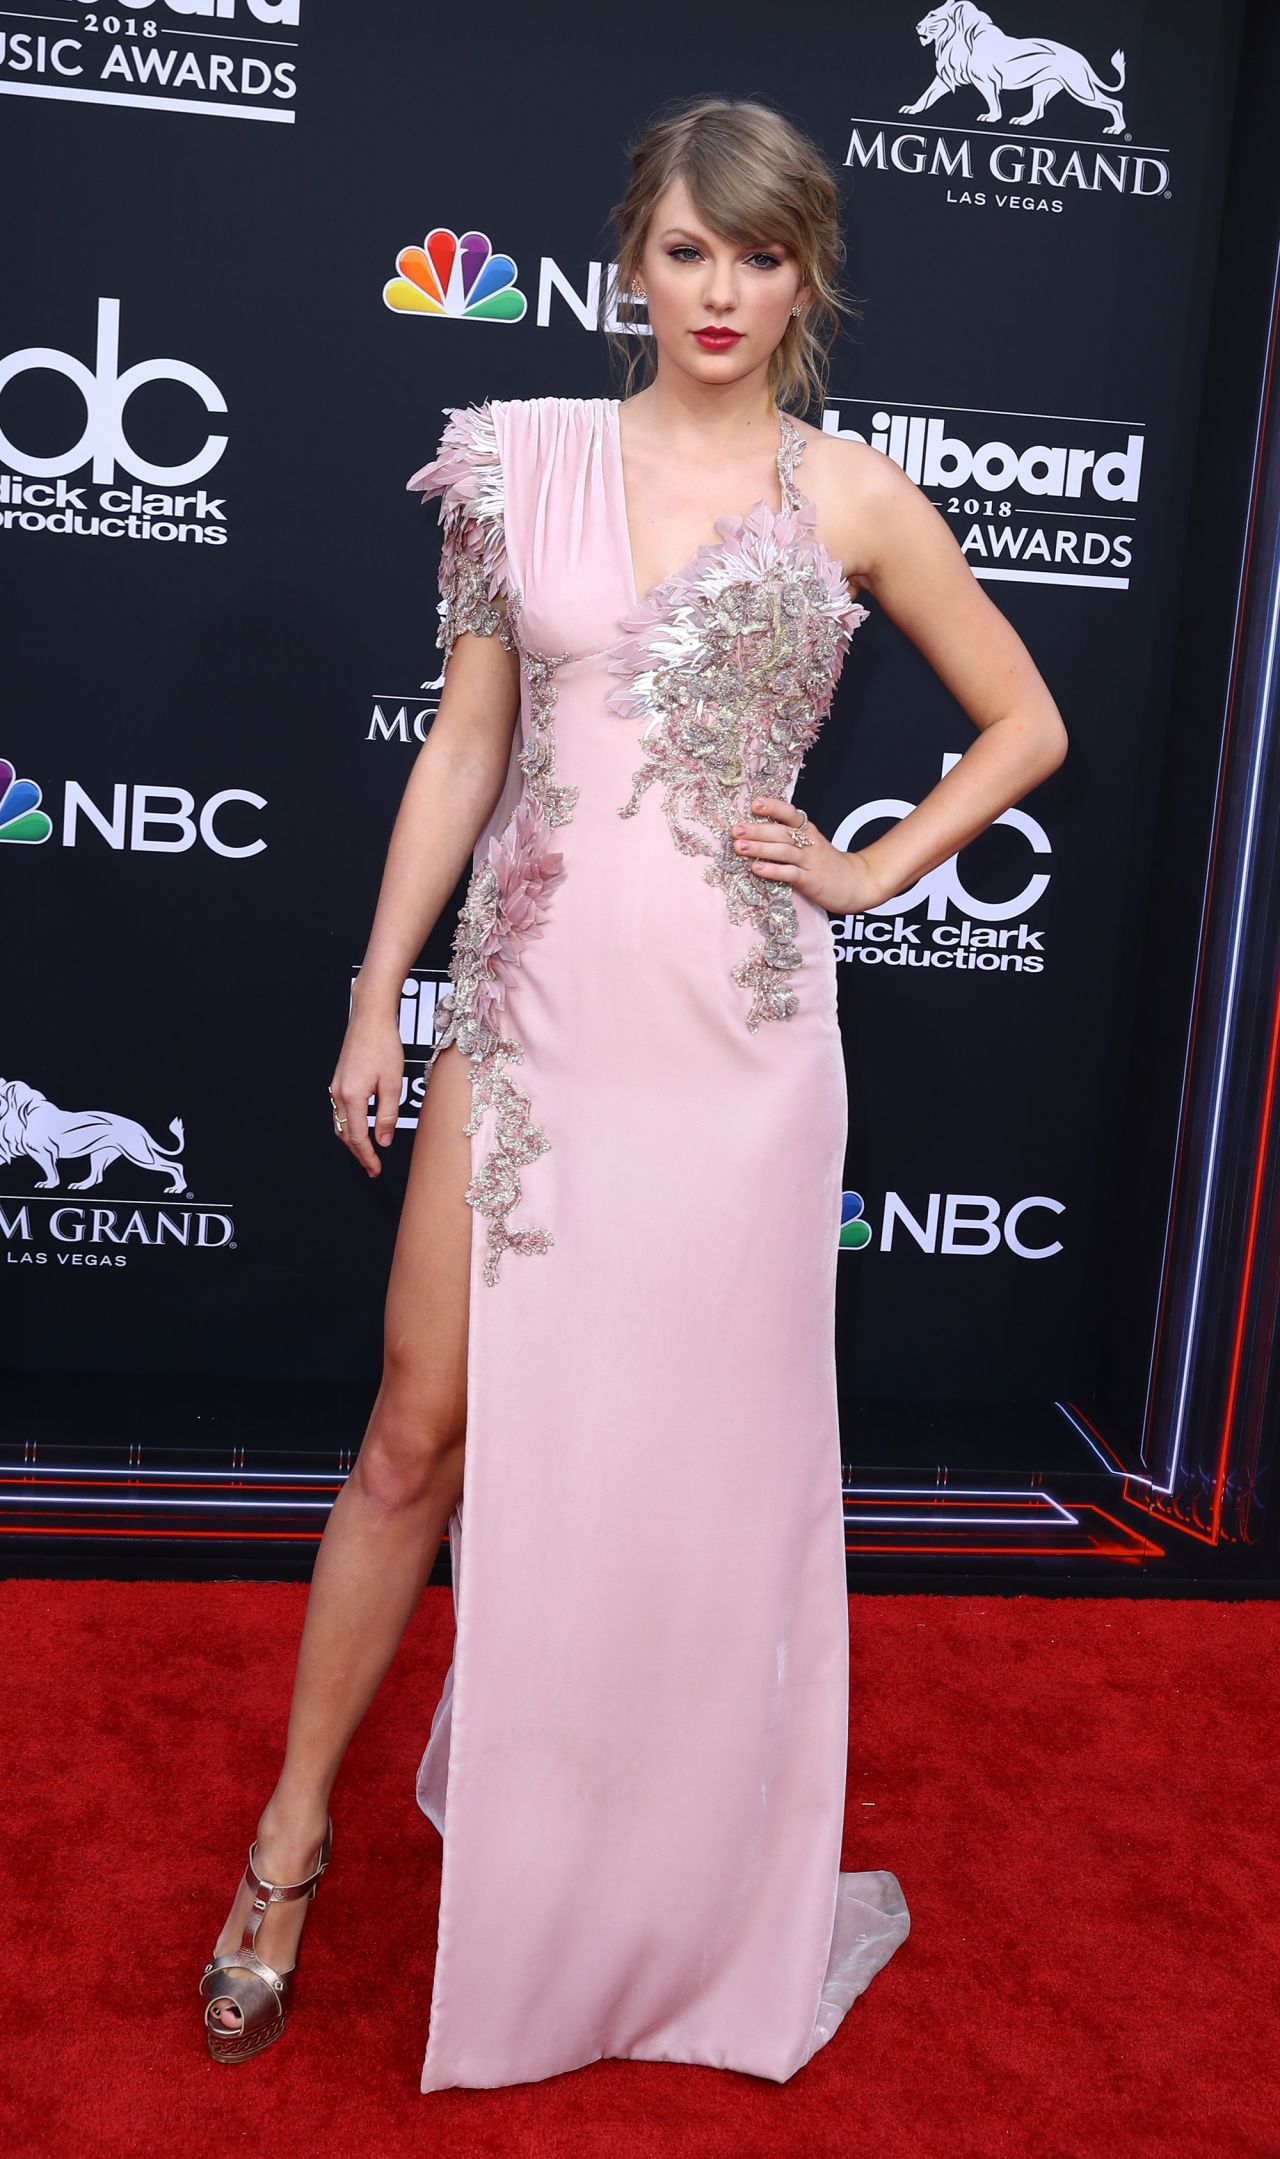 Billboard Music Awards 2016 The Best Hair And Makeup: 2018 Billboard Music Awards In Las Vegas